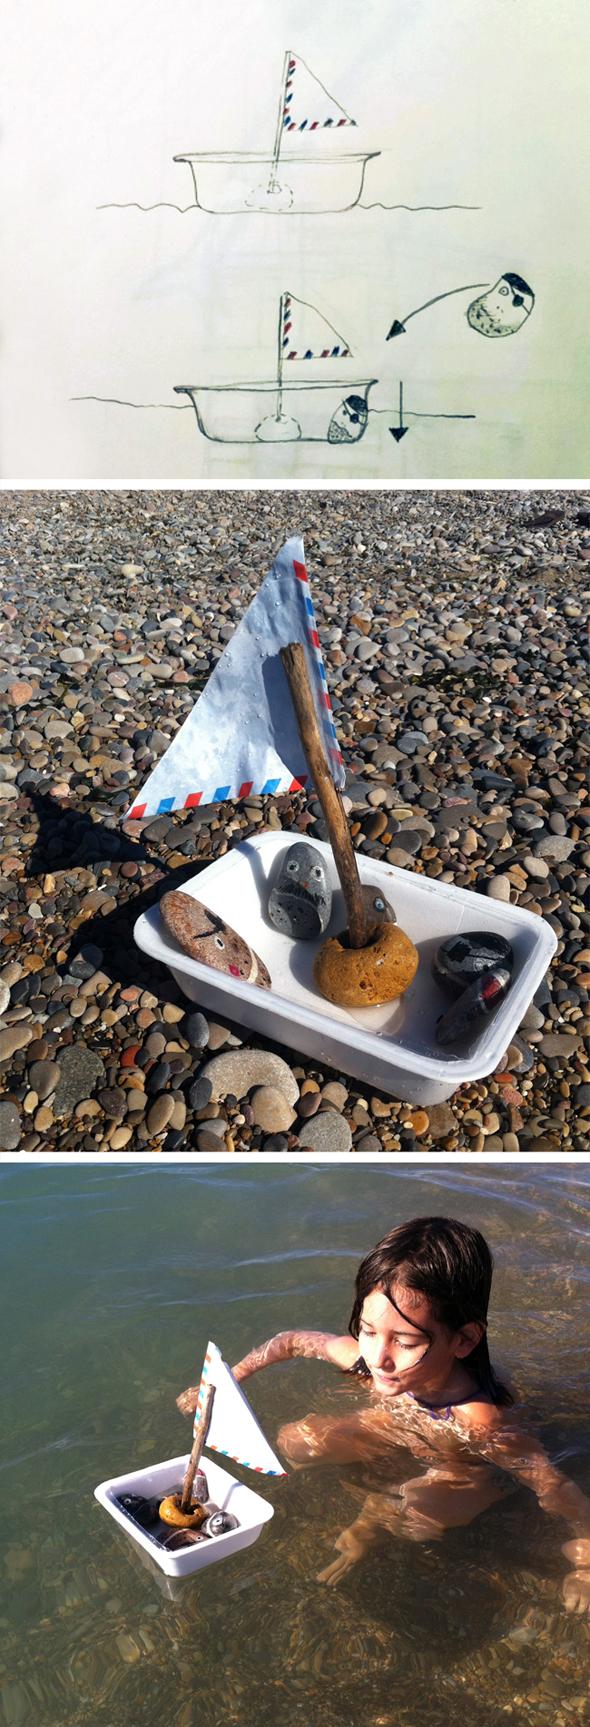 barco piedra reciclar boot kinder niños recycling steine piraten piratas pirats kids rocks fun water craft